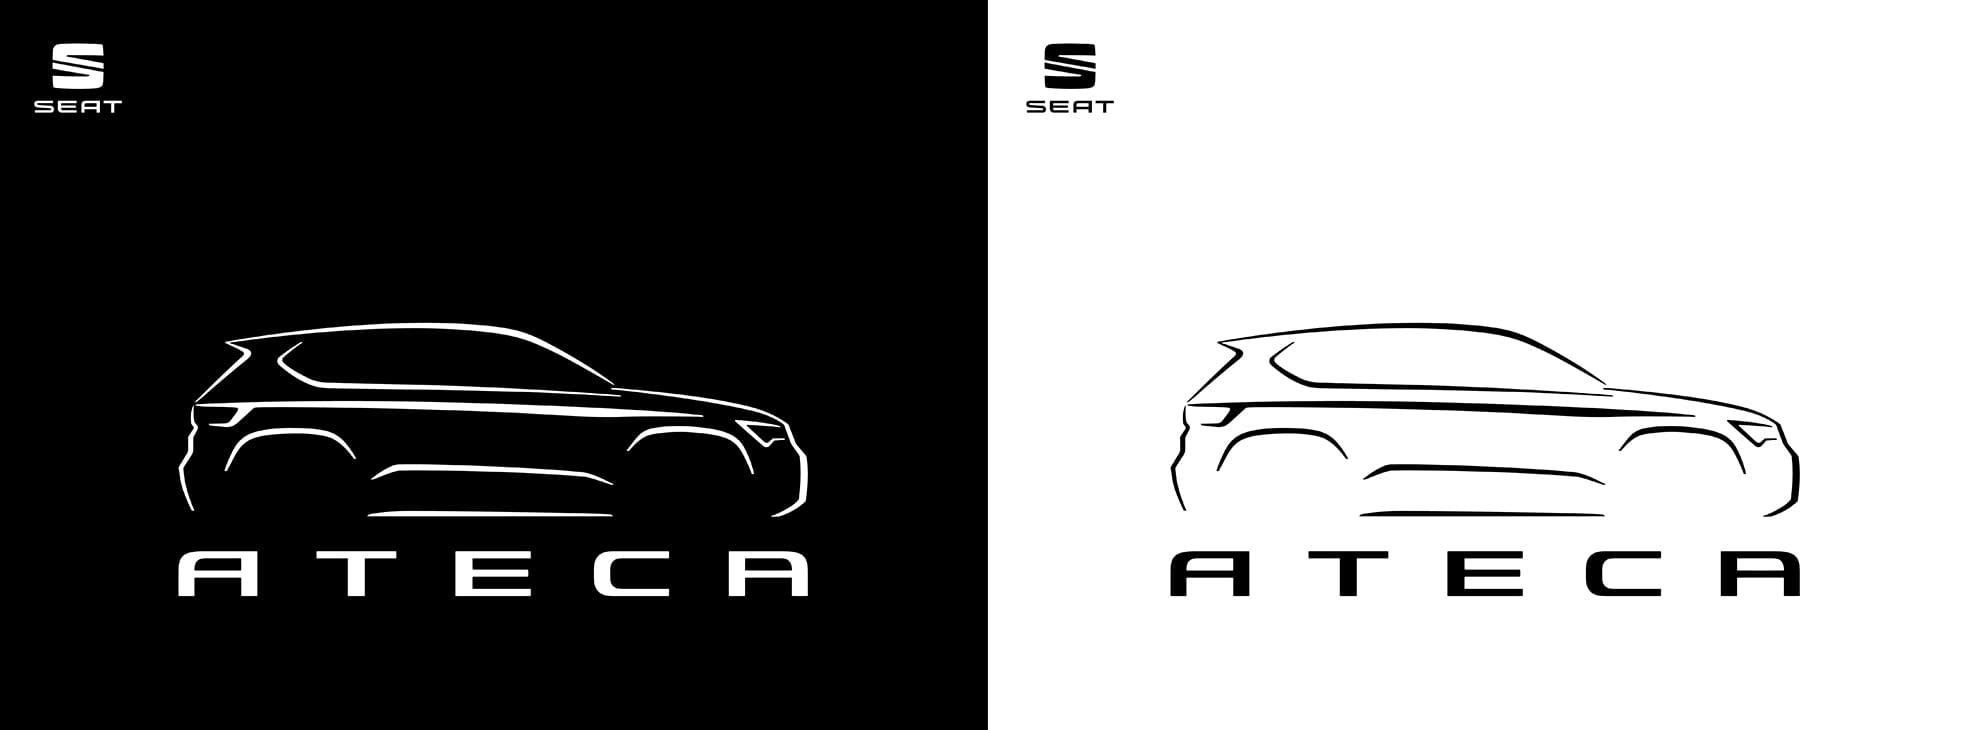 web-portfolio-seat-ateca-grafica-eventi-panels-logo